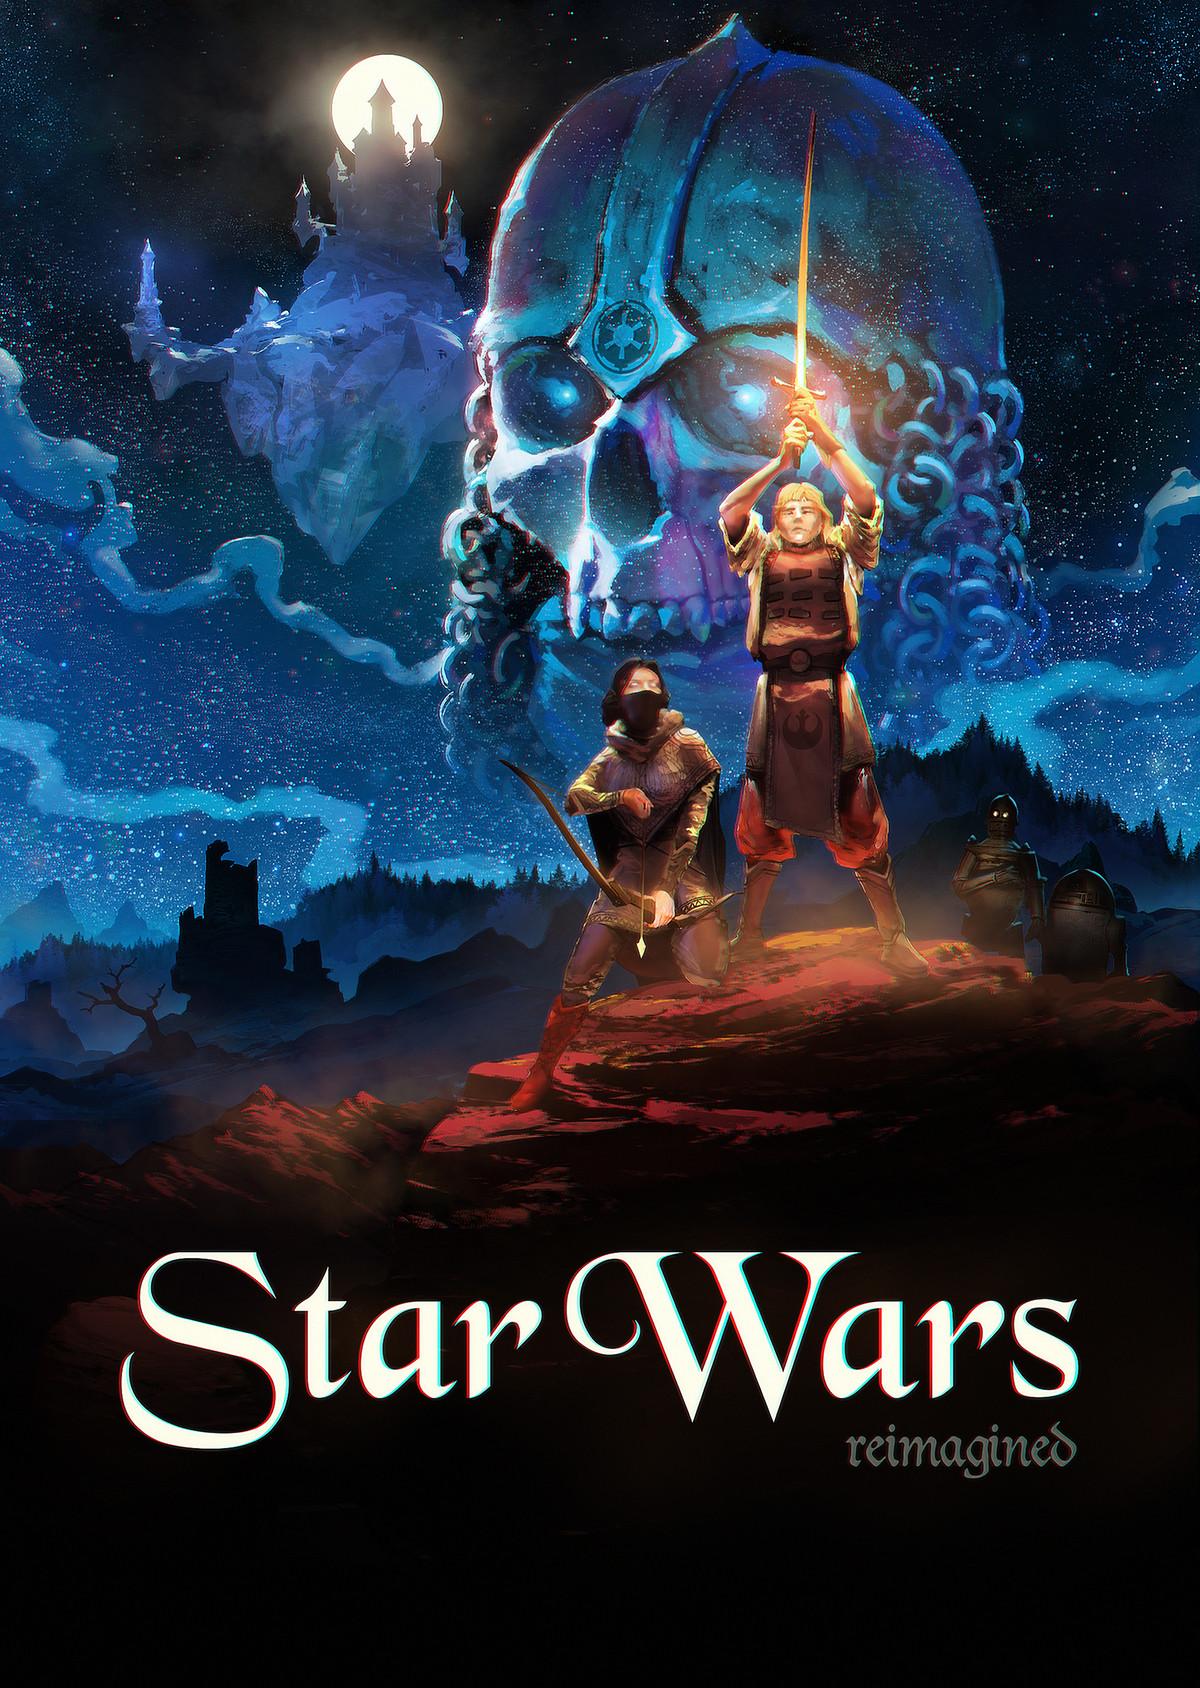 Alfred khamidullin star wars reimagined